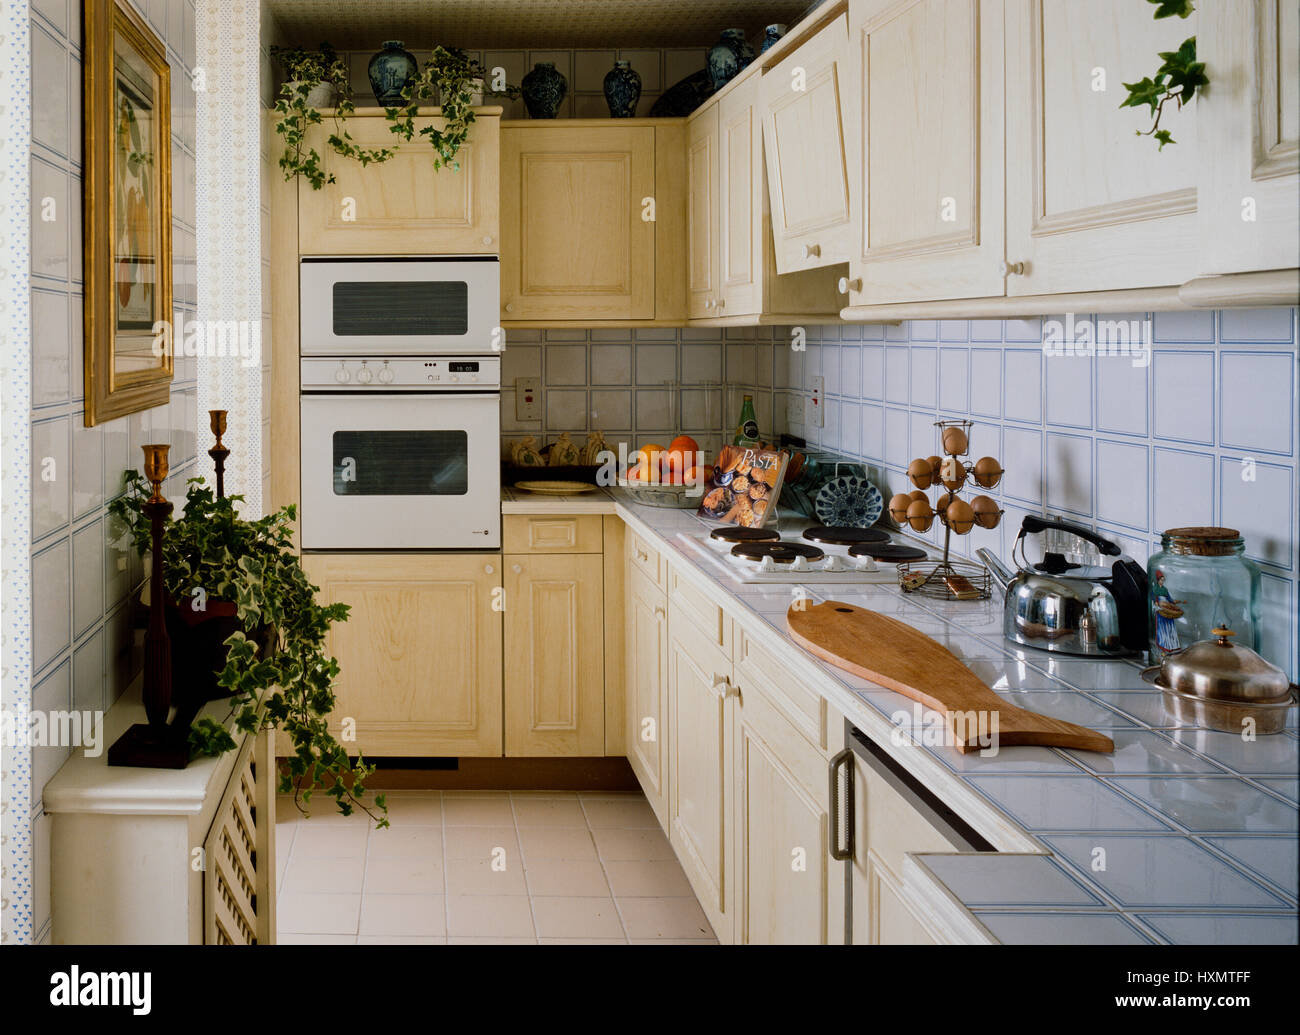 Credenza della cucina immagini & credenza della cucina fotos stock